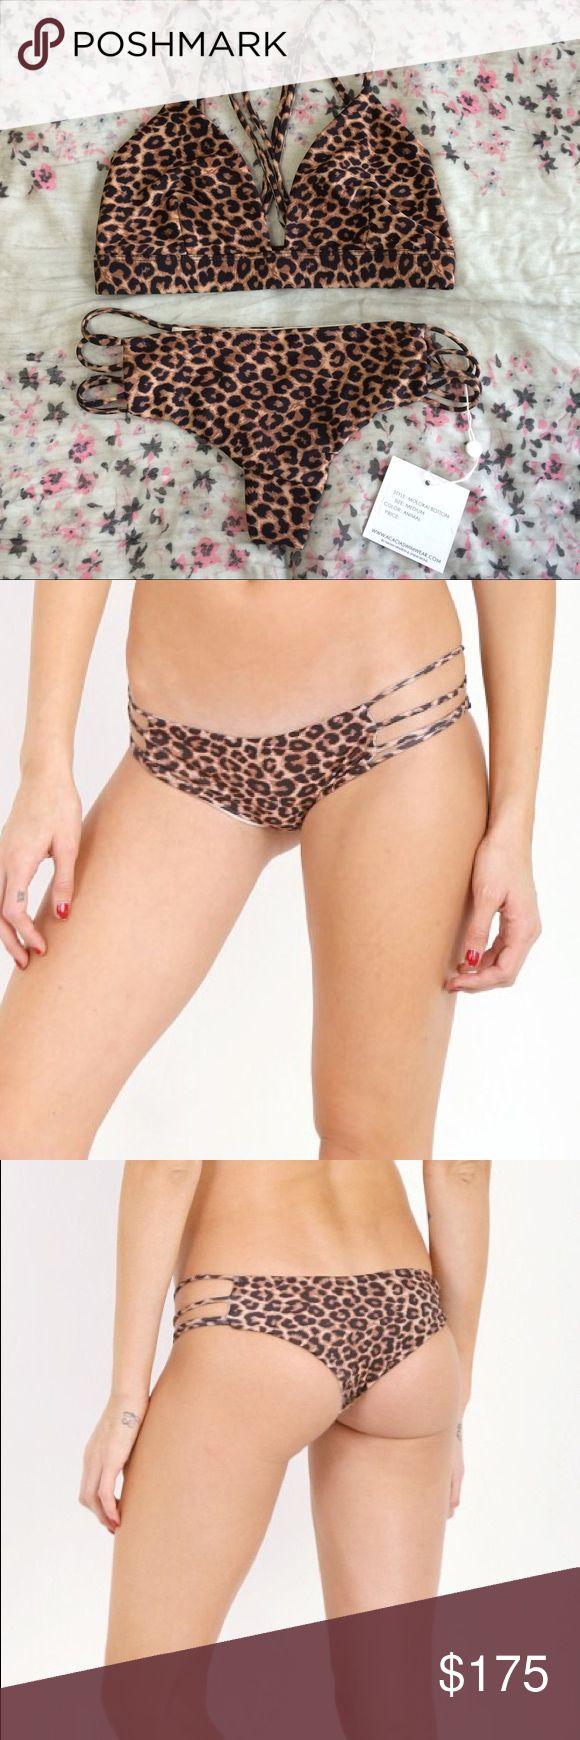 Acacia Swimwear Animal Leopard Bikini Set NWT Acacia Swimwear Molokai bottom in Animal, size medium. Matched with EUC Awapui top in Animal, also size medium. ✨Price reflects that Posh charges a 20% fee, will sell for less elsewhere acacia swimwear Swim Bikinis